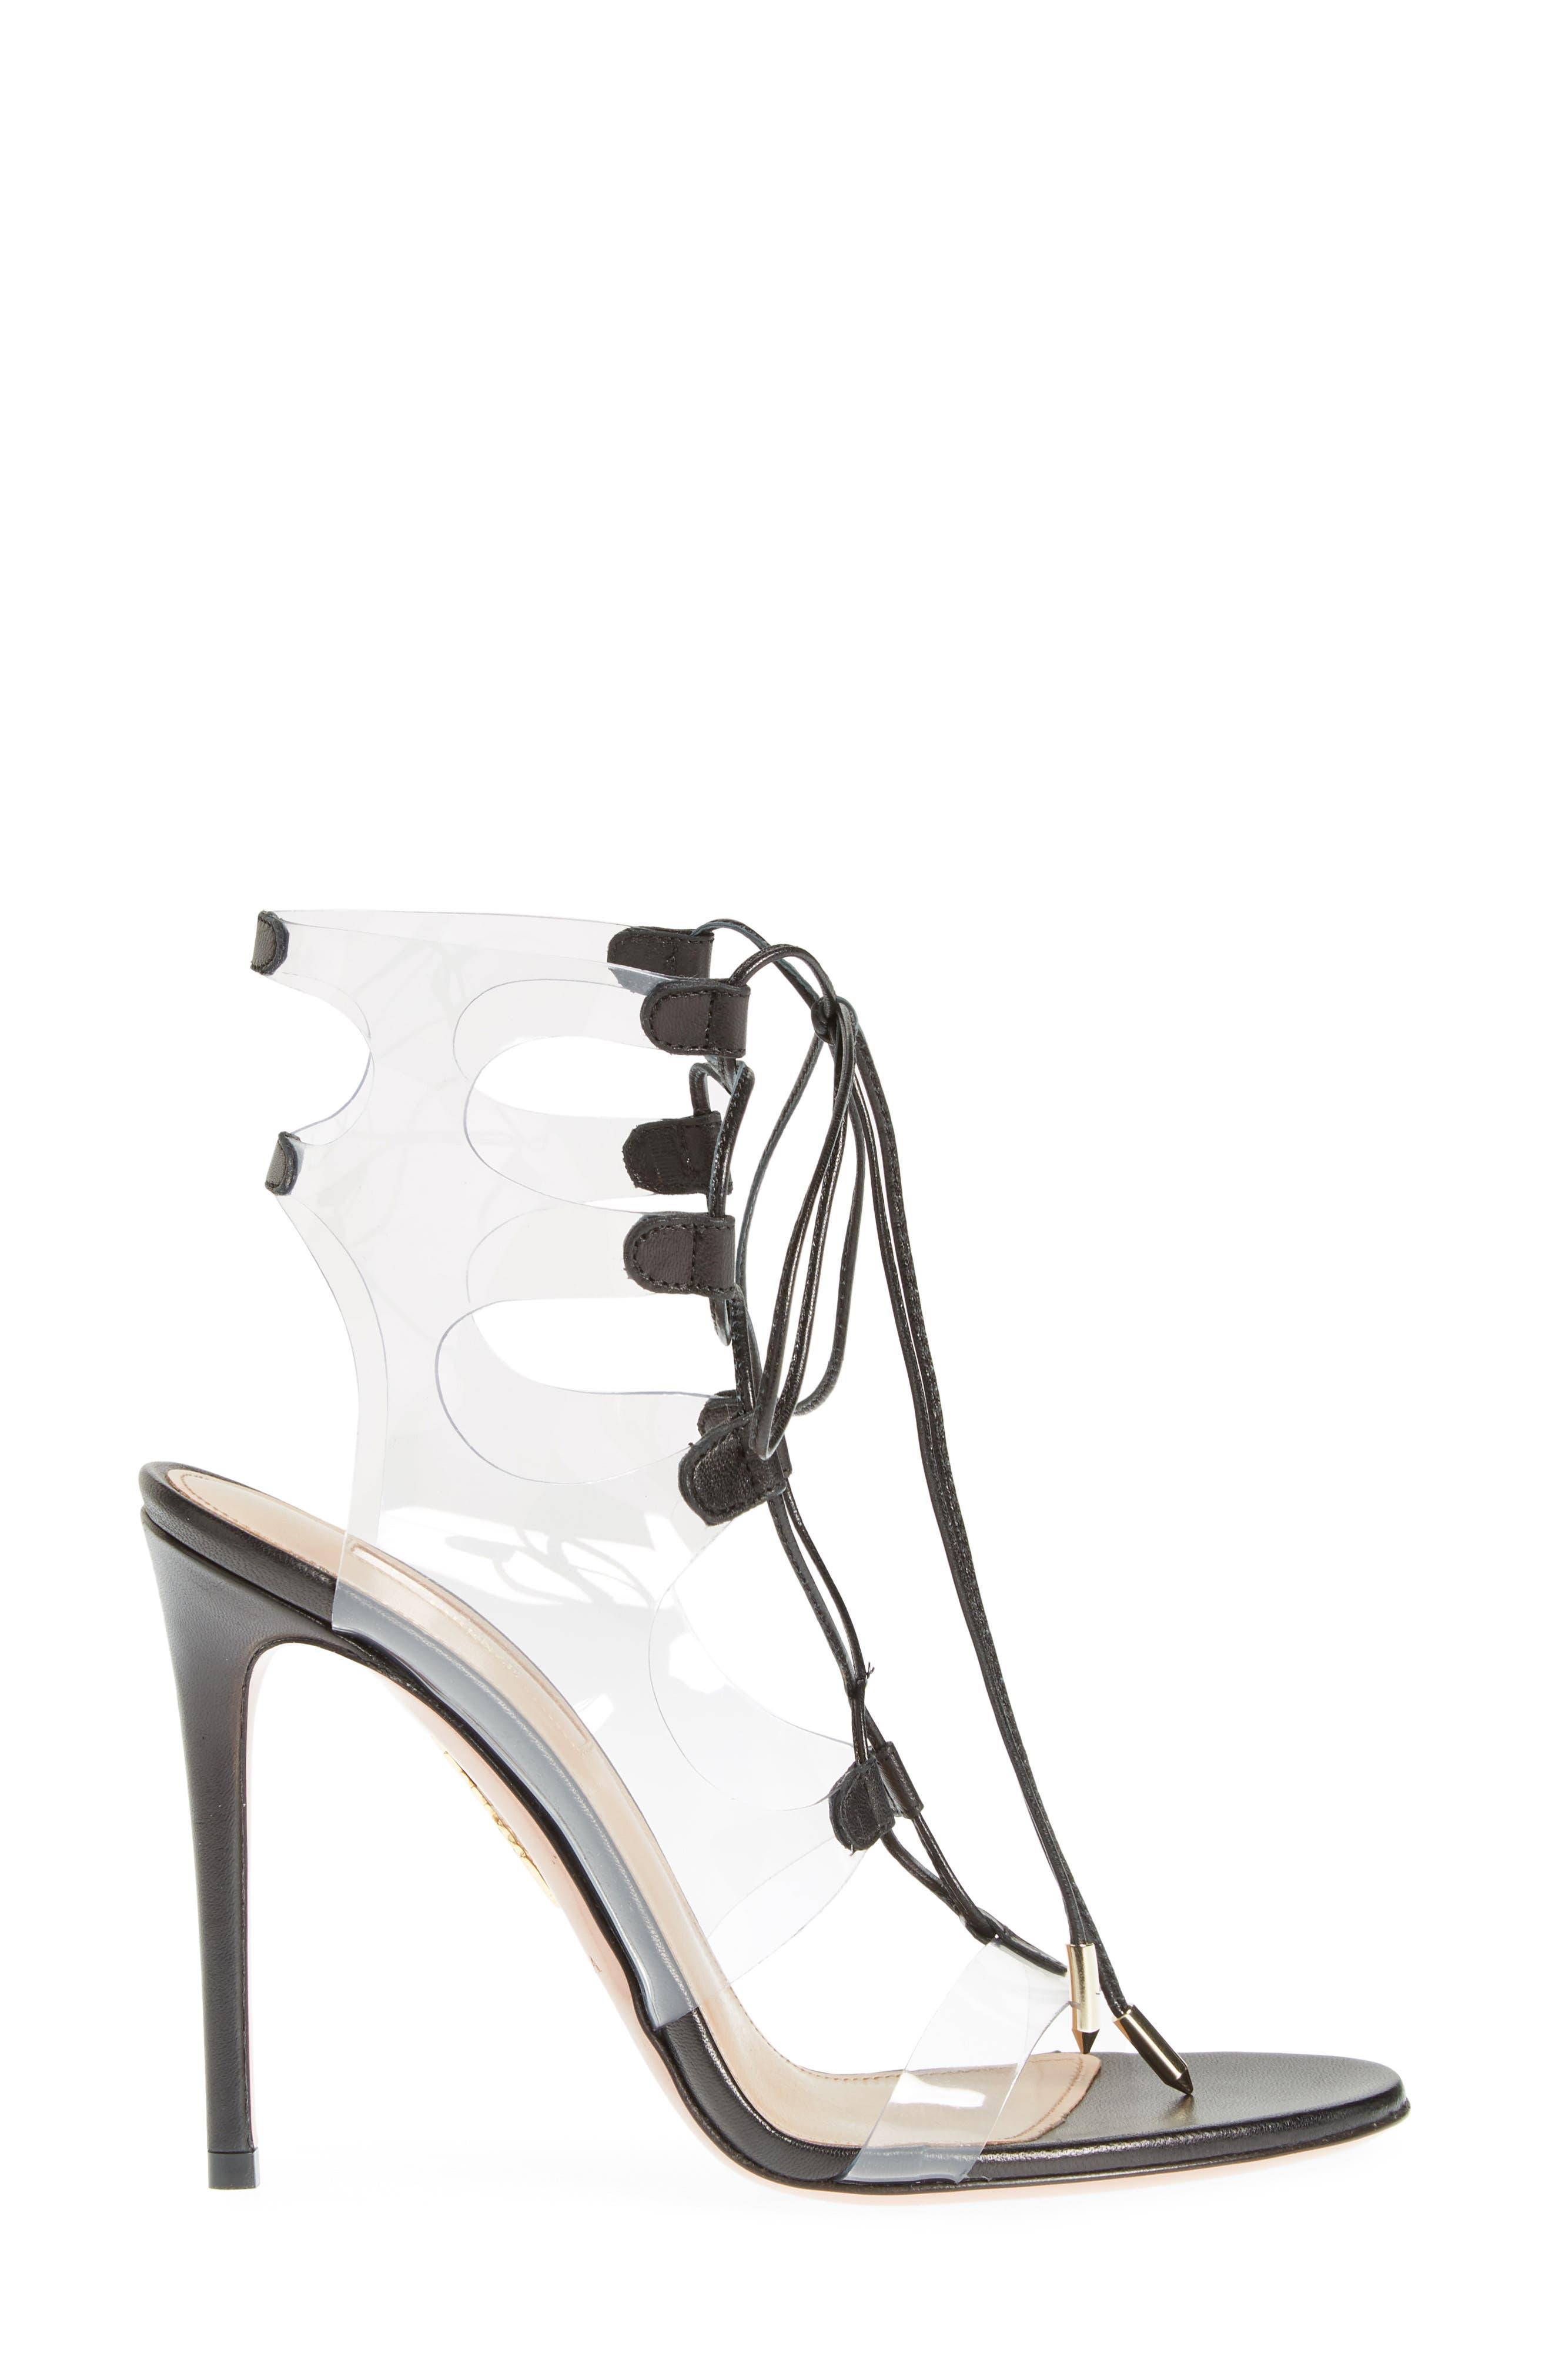 AQUAZZURA, Milos PVC Lace-Up Sandal, Alternate thumbnail 3, color, BLACK